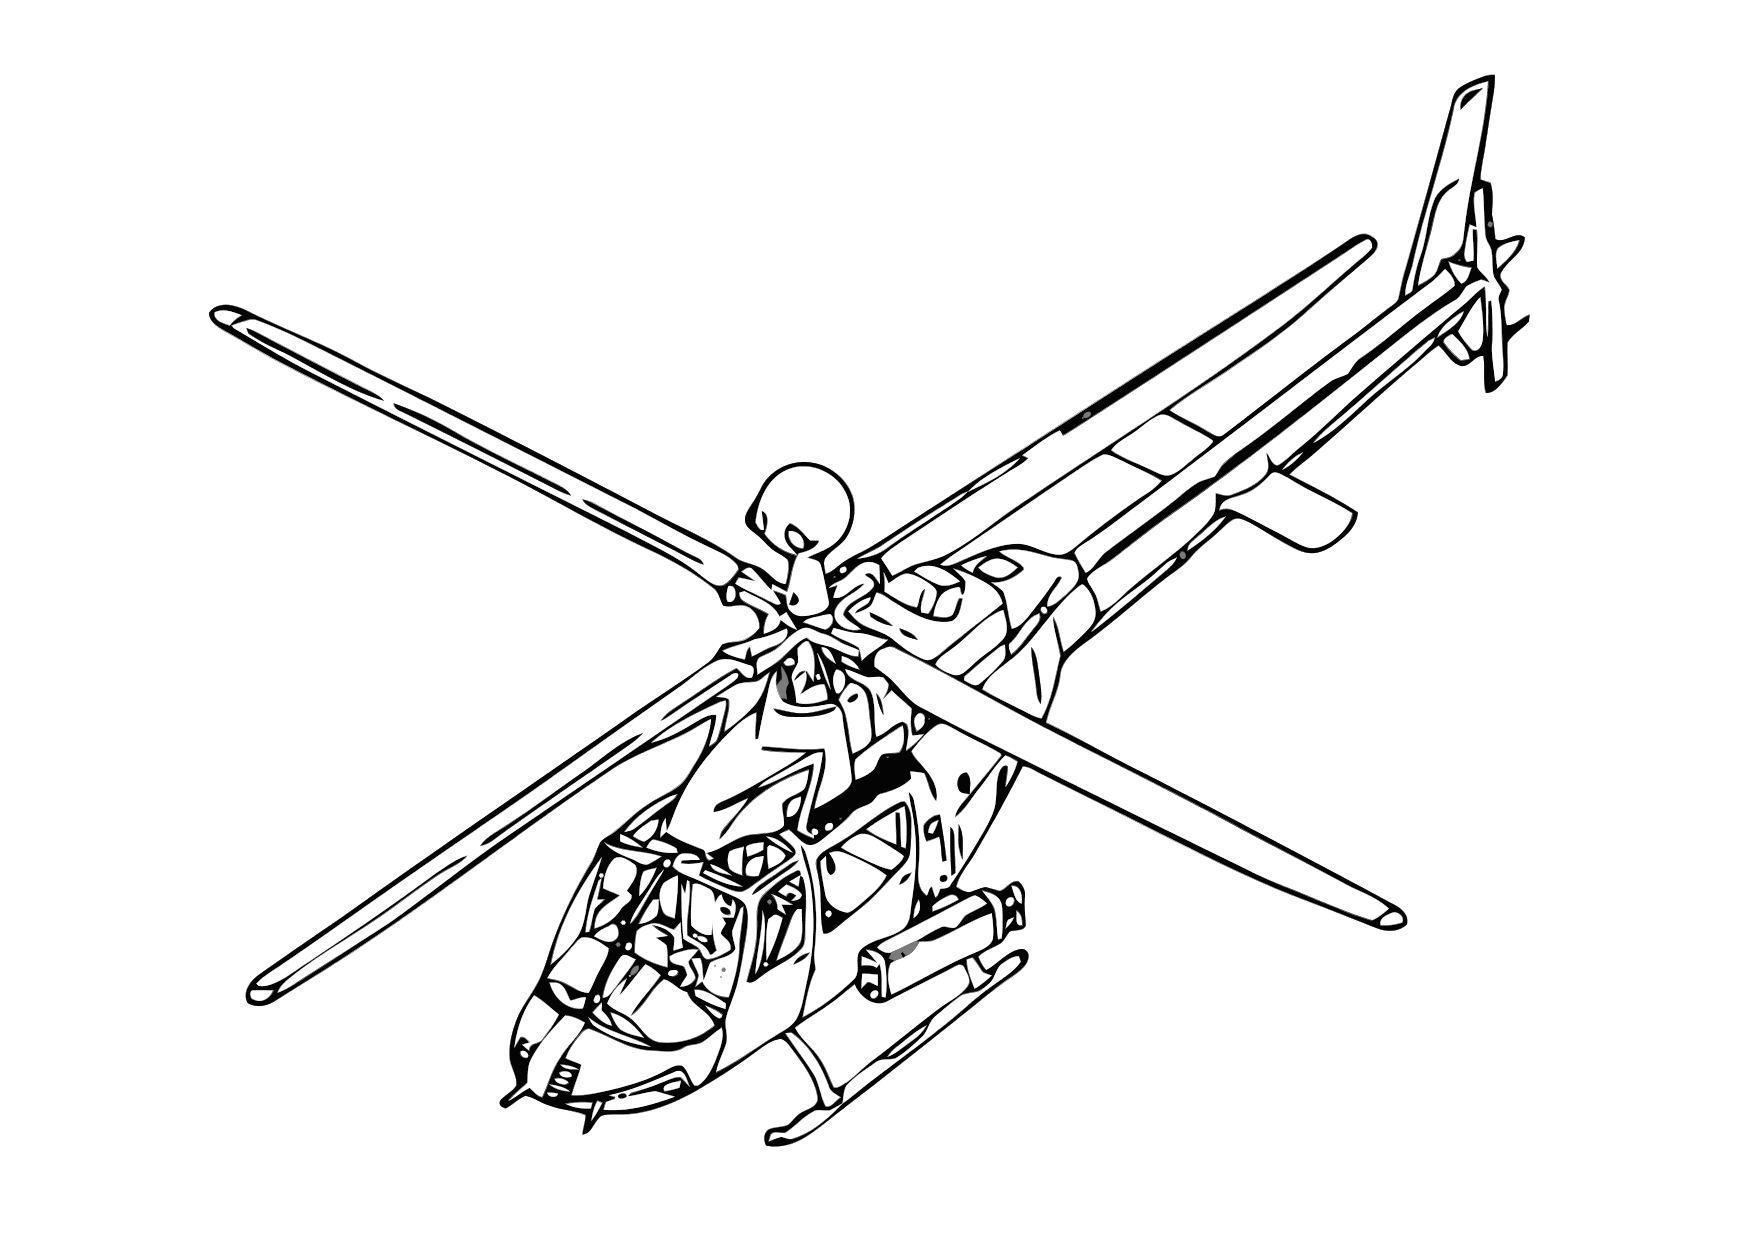 Disegno Da Colorare Elicottero Cat 11862 Images